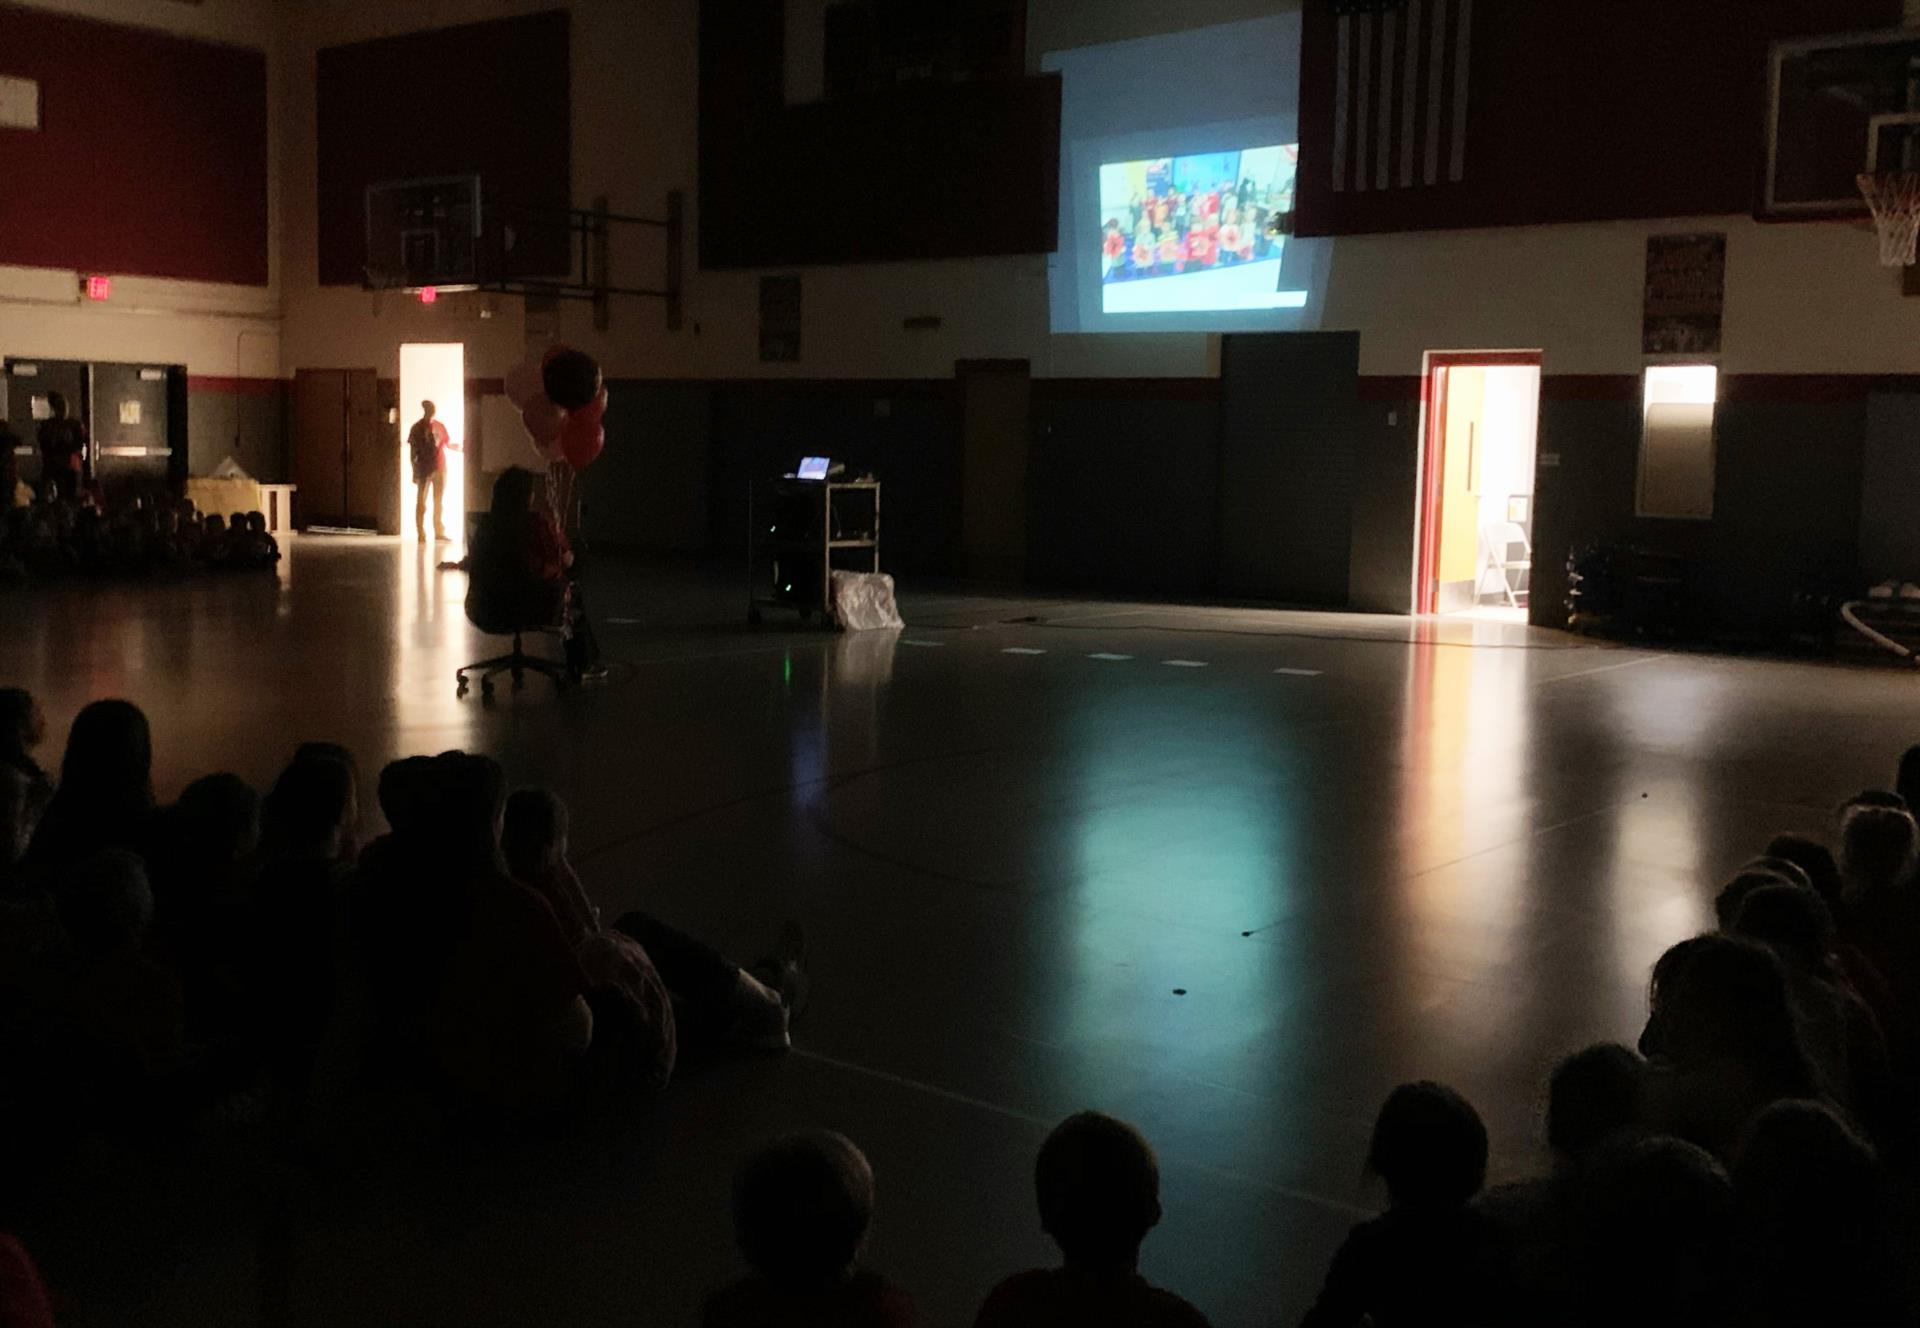 principal hammond watching thank you video